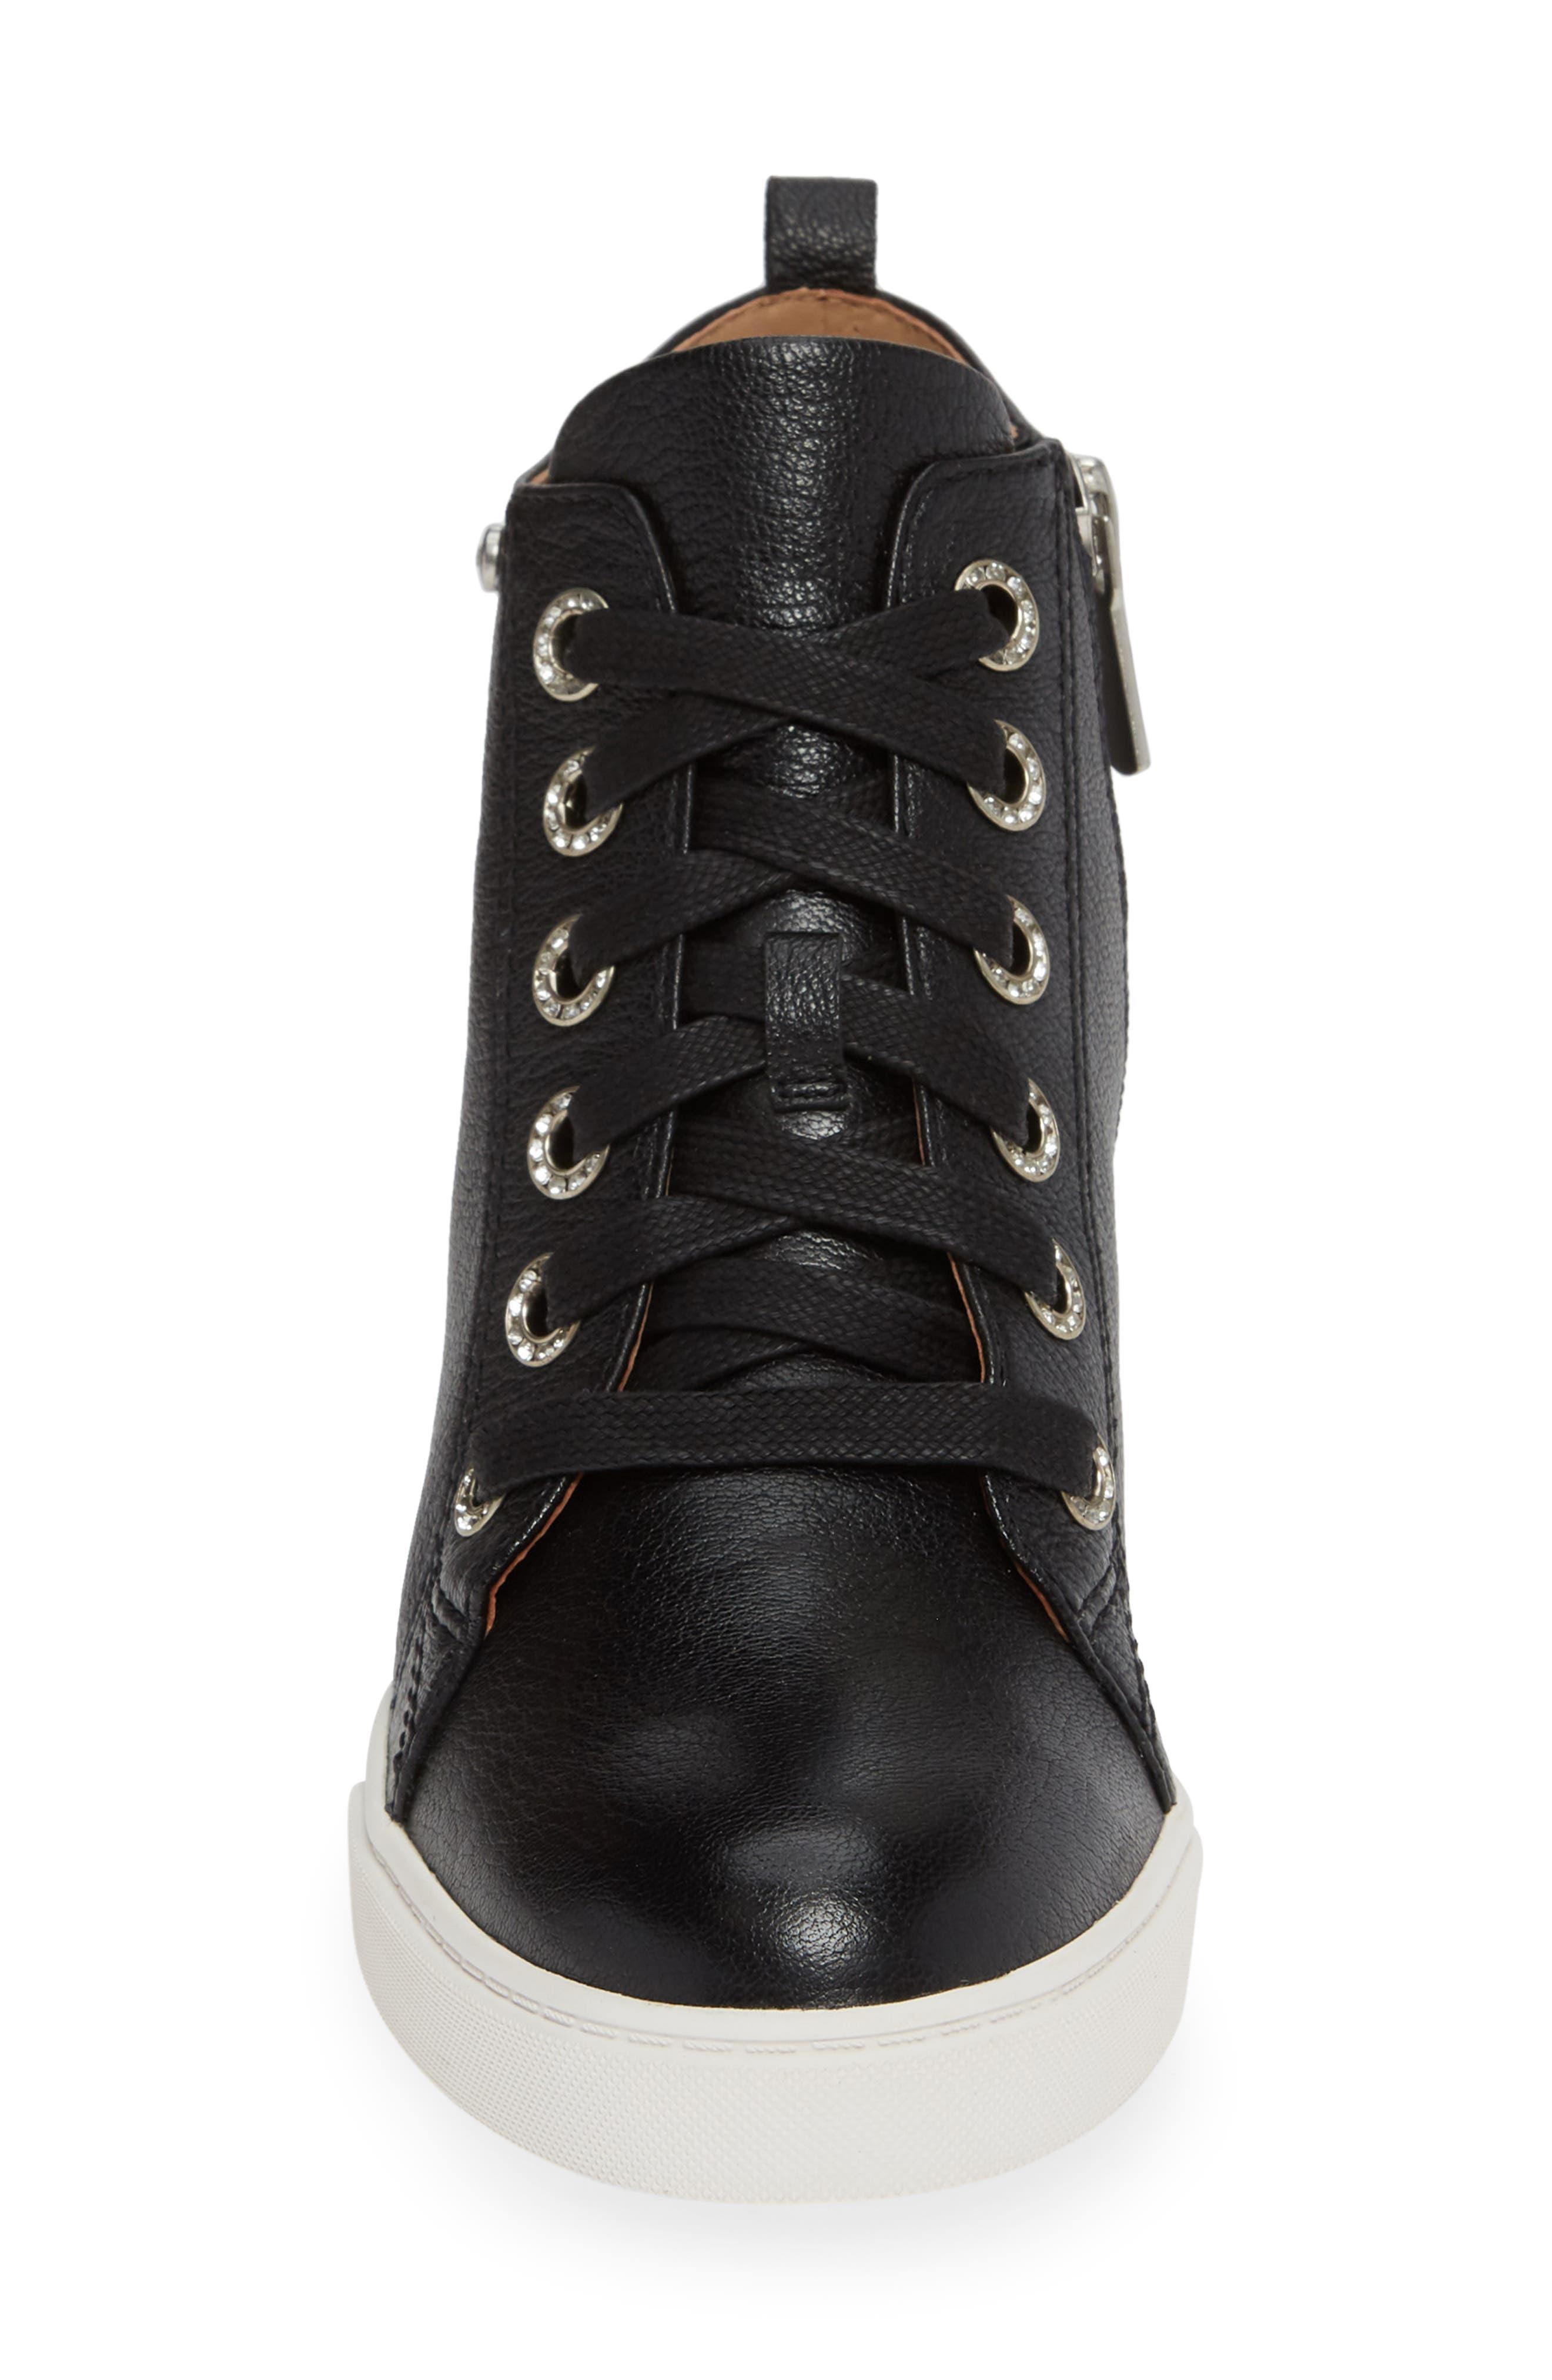 LINEA PAOLO, Flint Wedge Sneaker, Alternate thumbnail 4, color, BLACK LEATHER